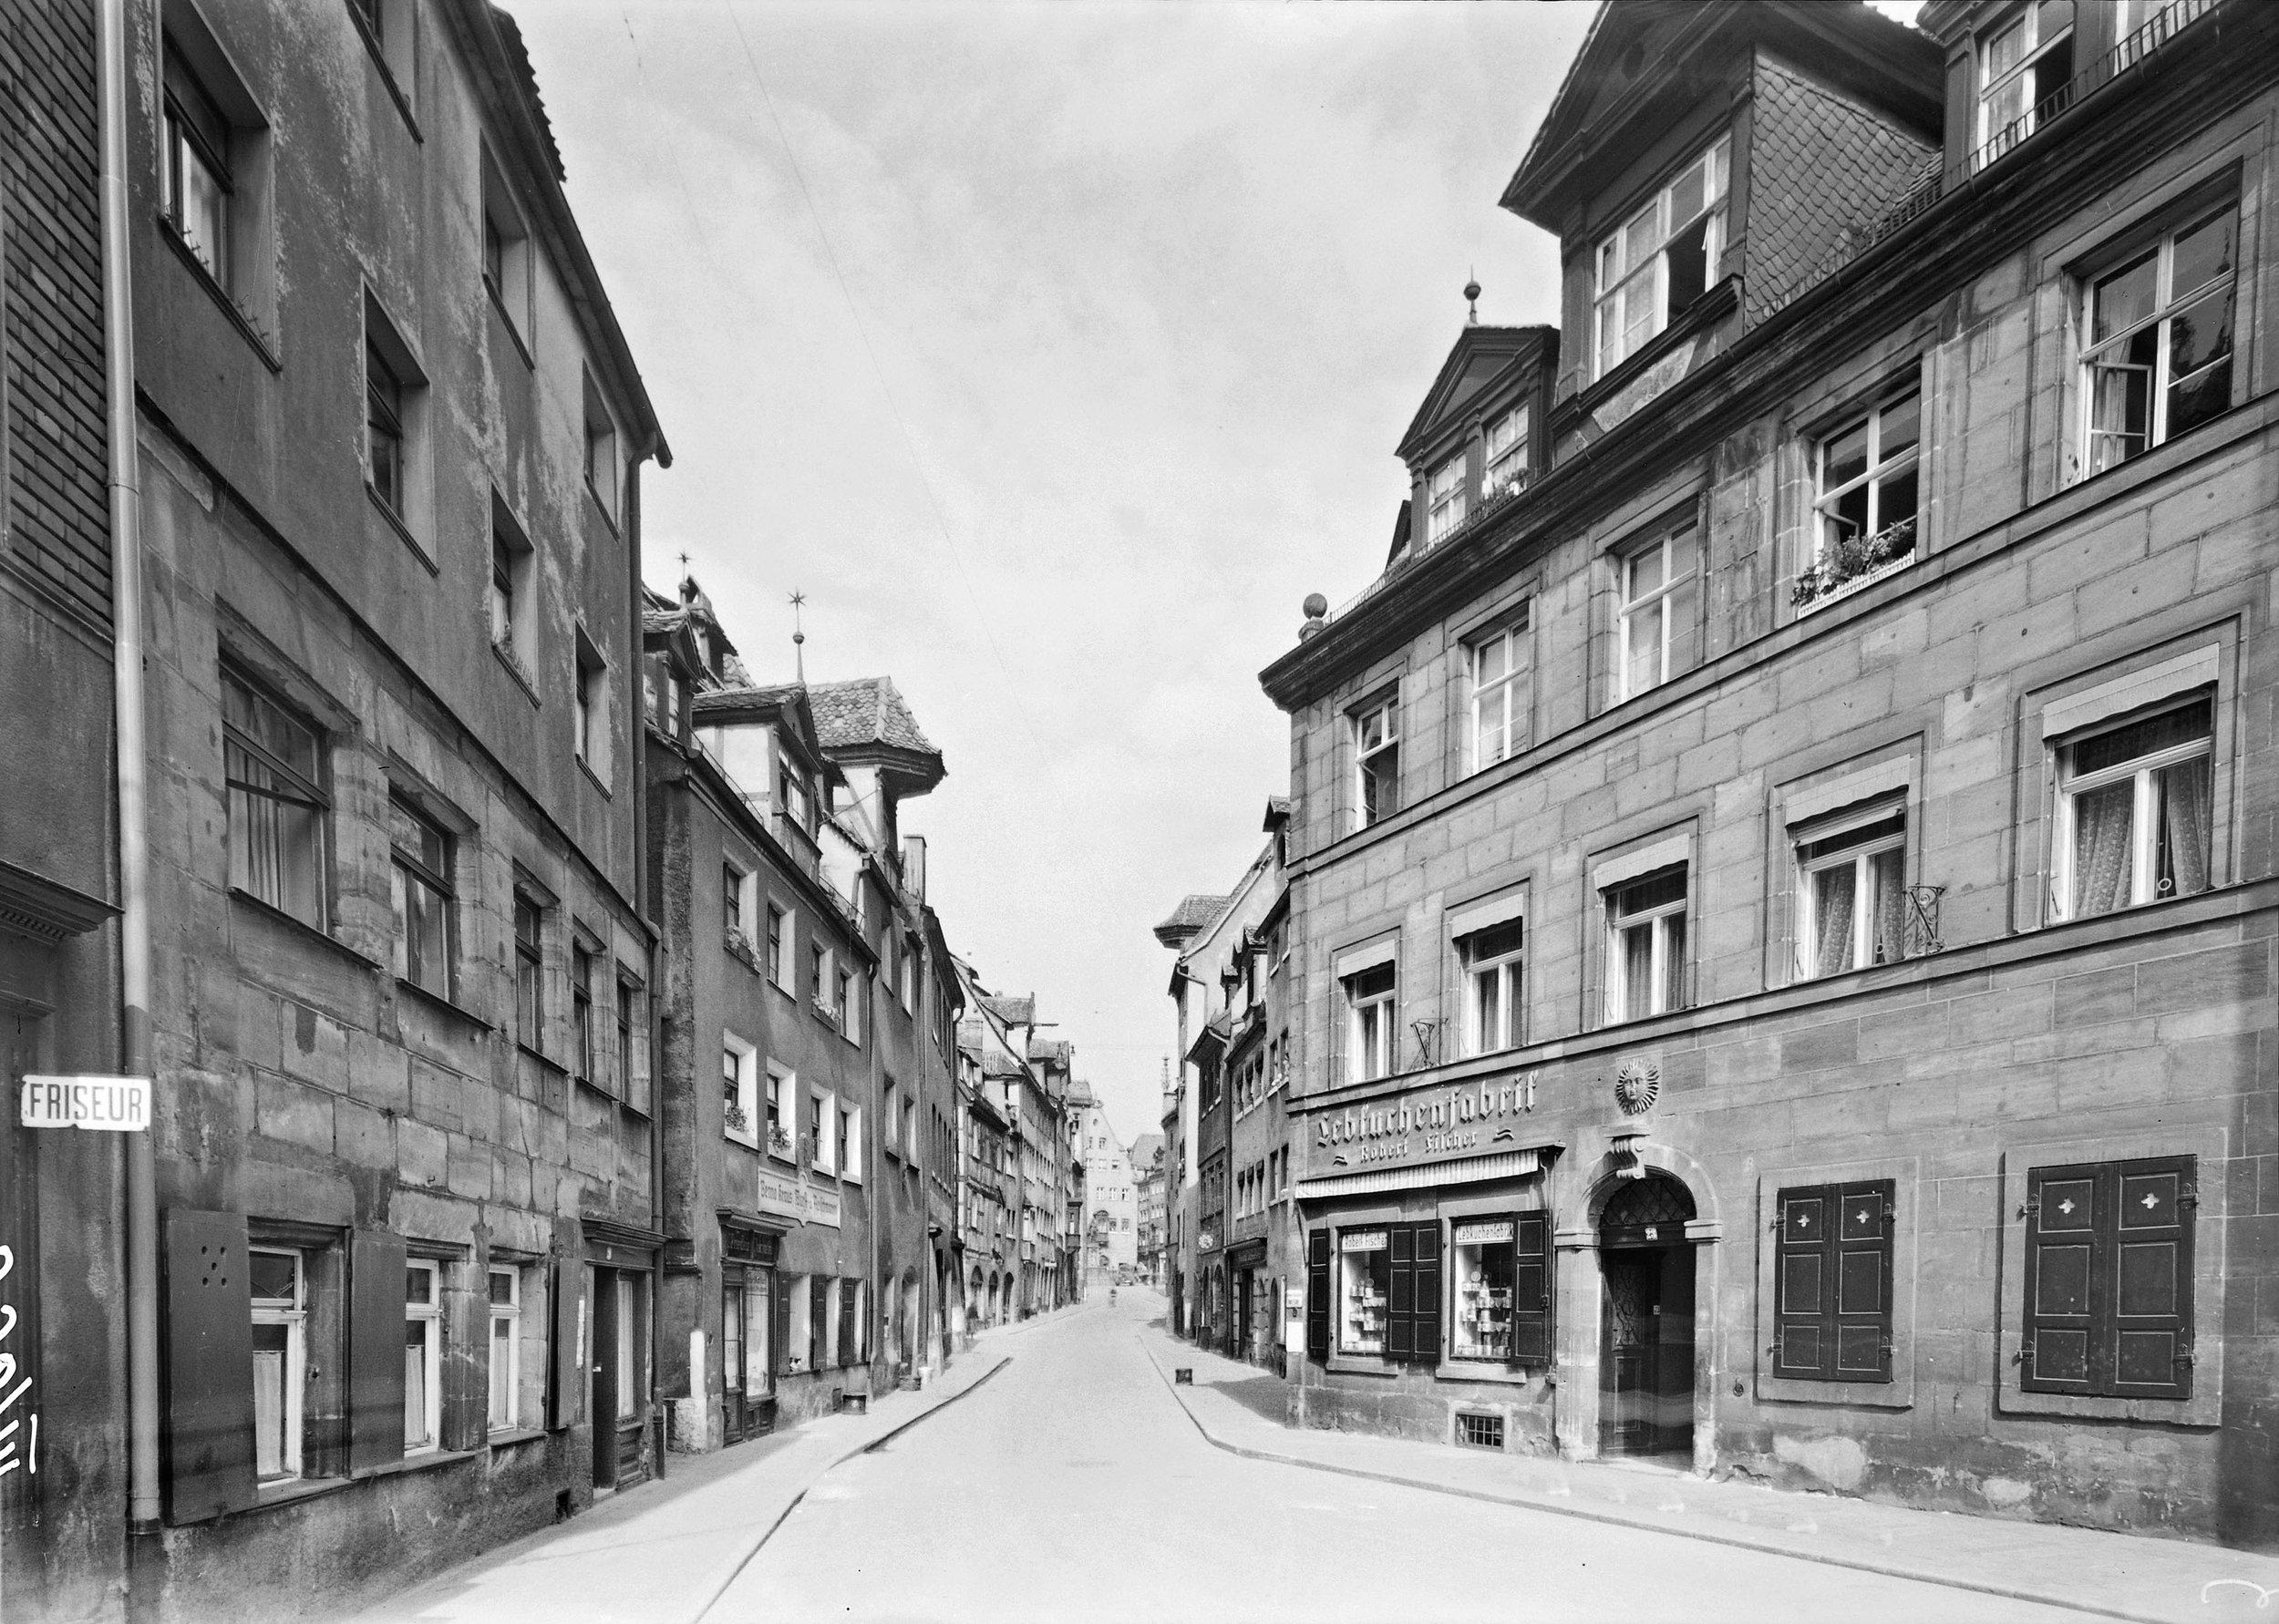 Blick in die Judengasse zum Theresienplatz. Foto Hochbauamt: Roeser, Juli 1942. (Stadtarchiv Nuernberg A 38 Nr. J-36-3)